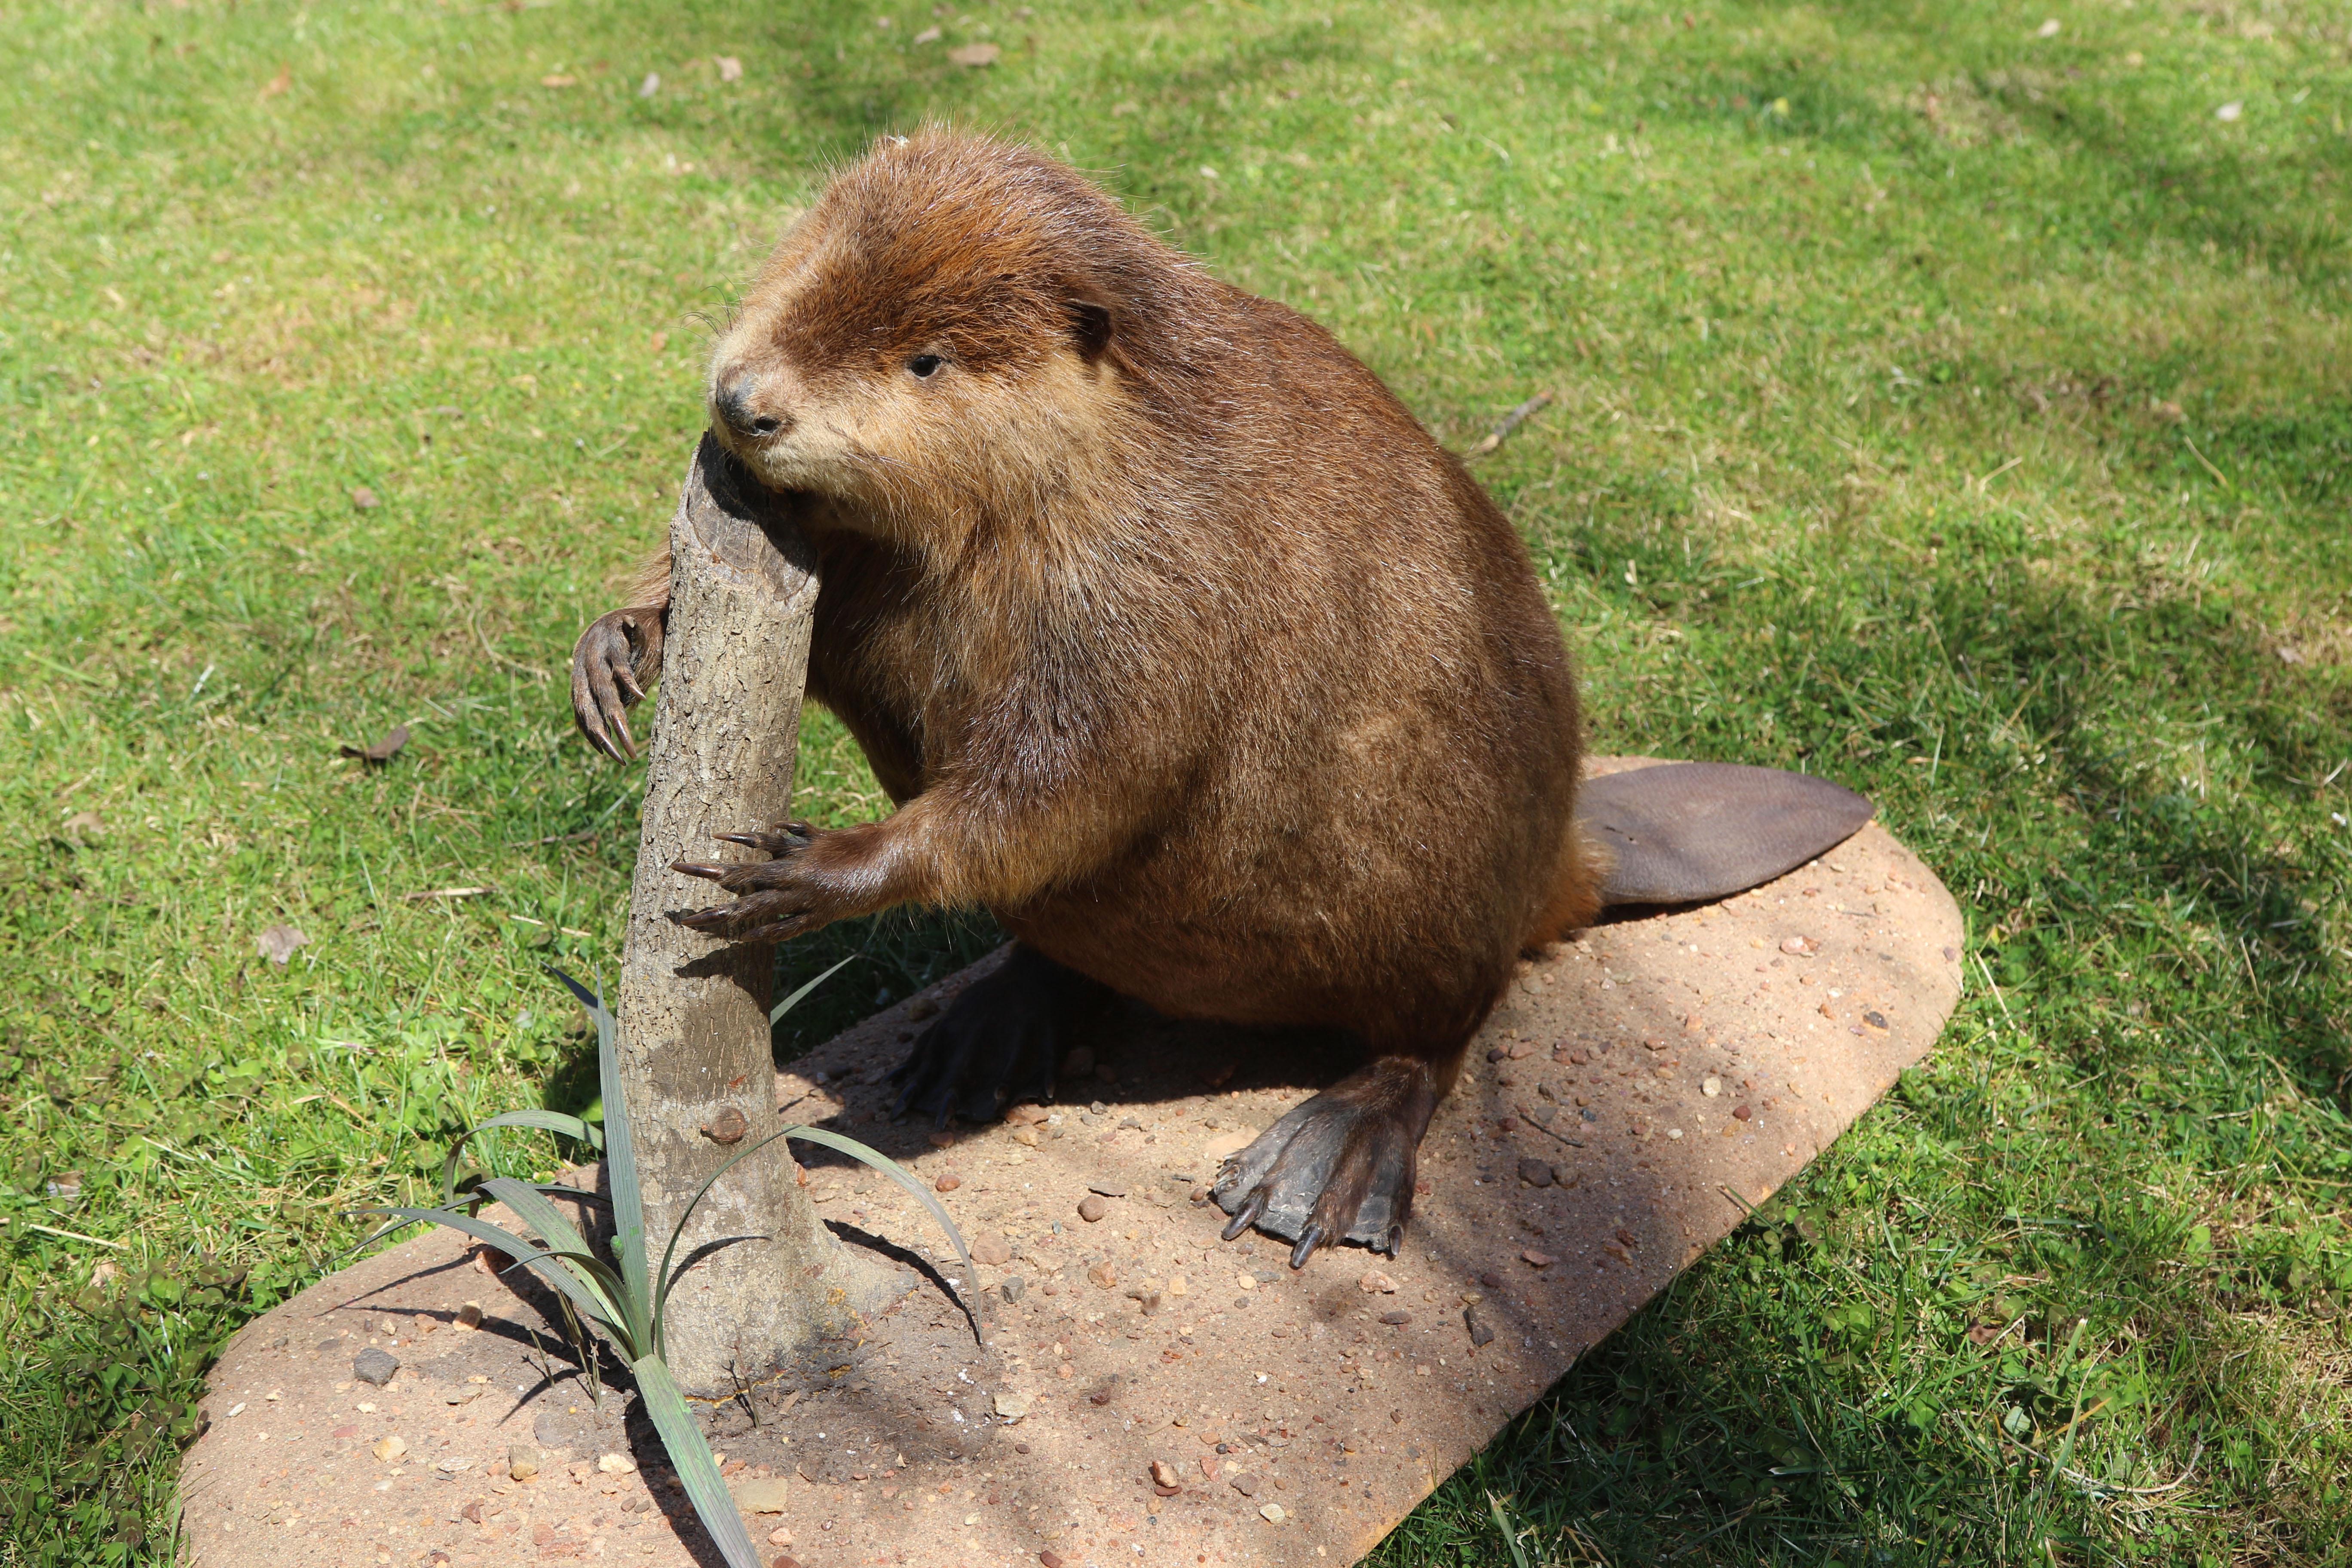 An American beaver holding a log